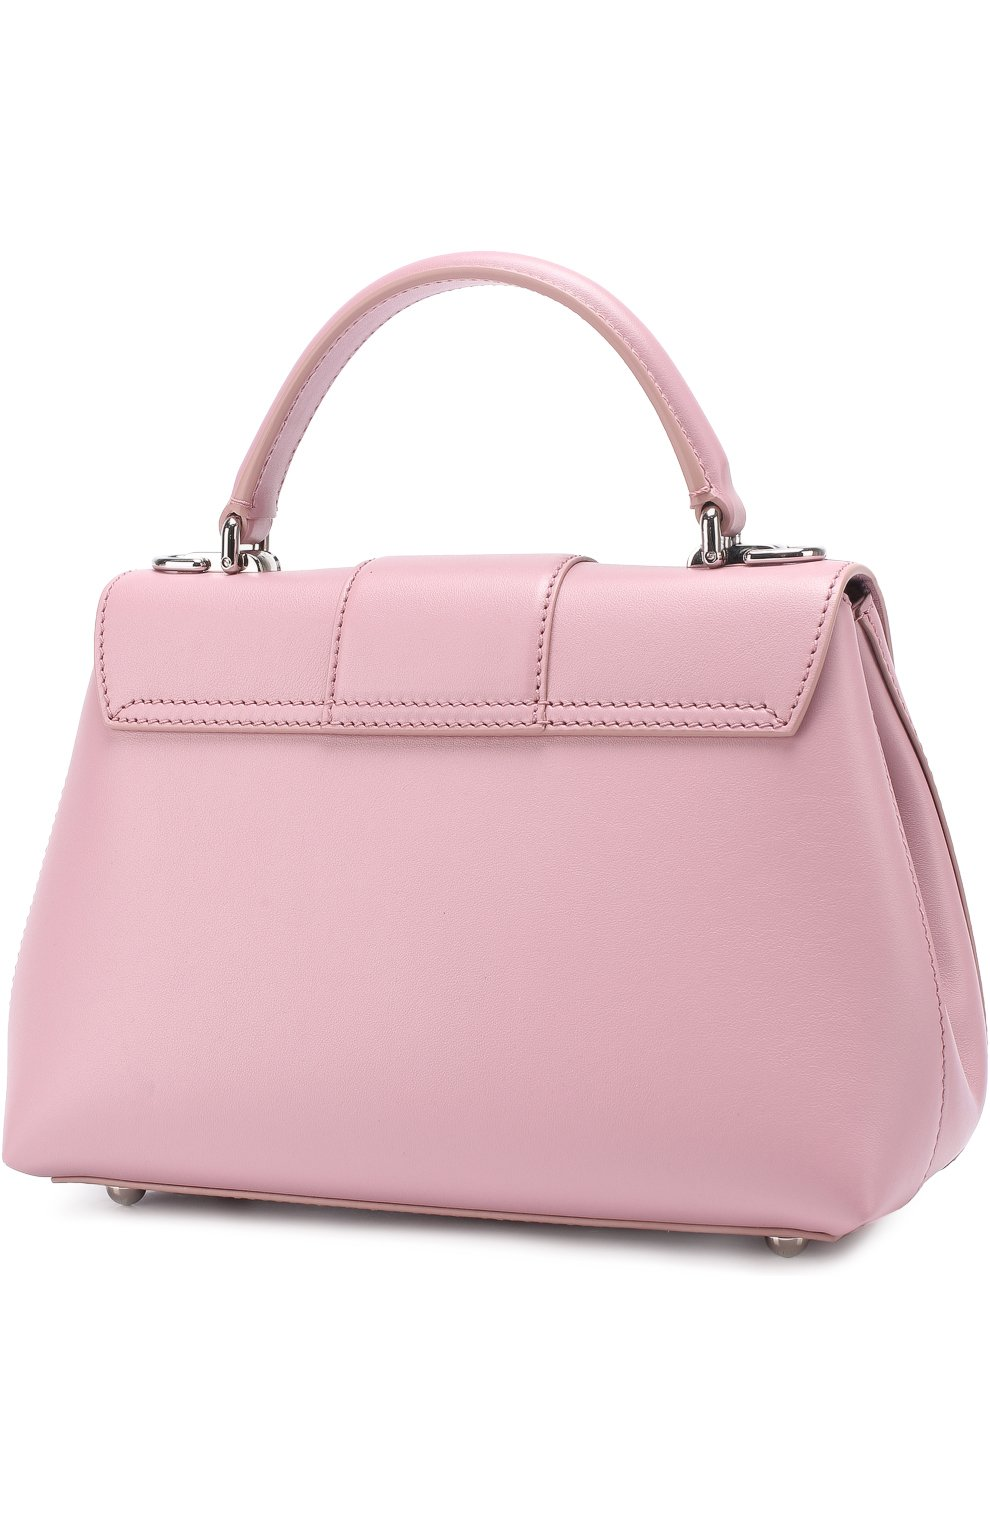 Сумка Lucia small Dolce & Gabbana розовая цвета   Фото №3